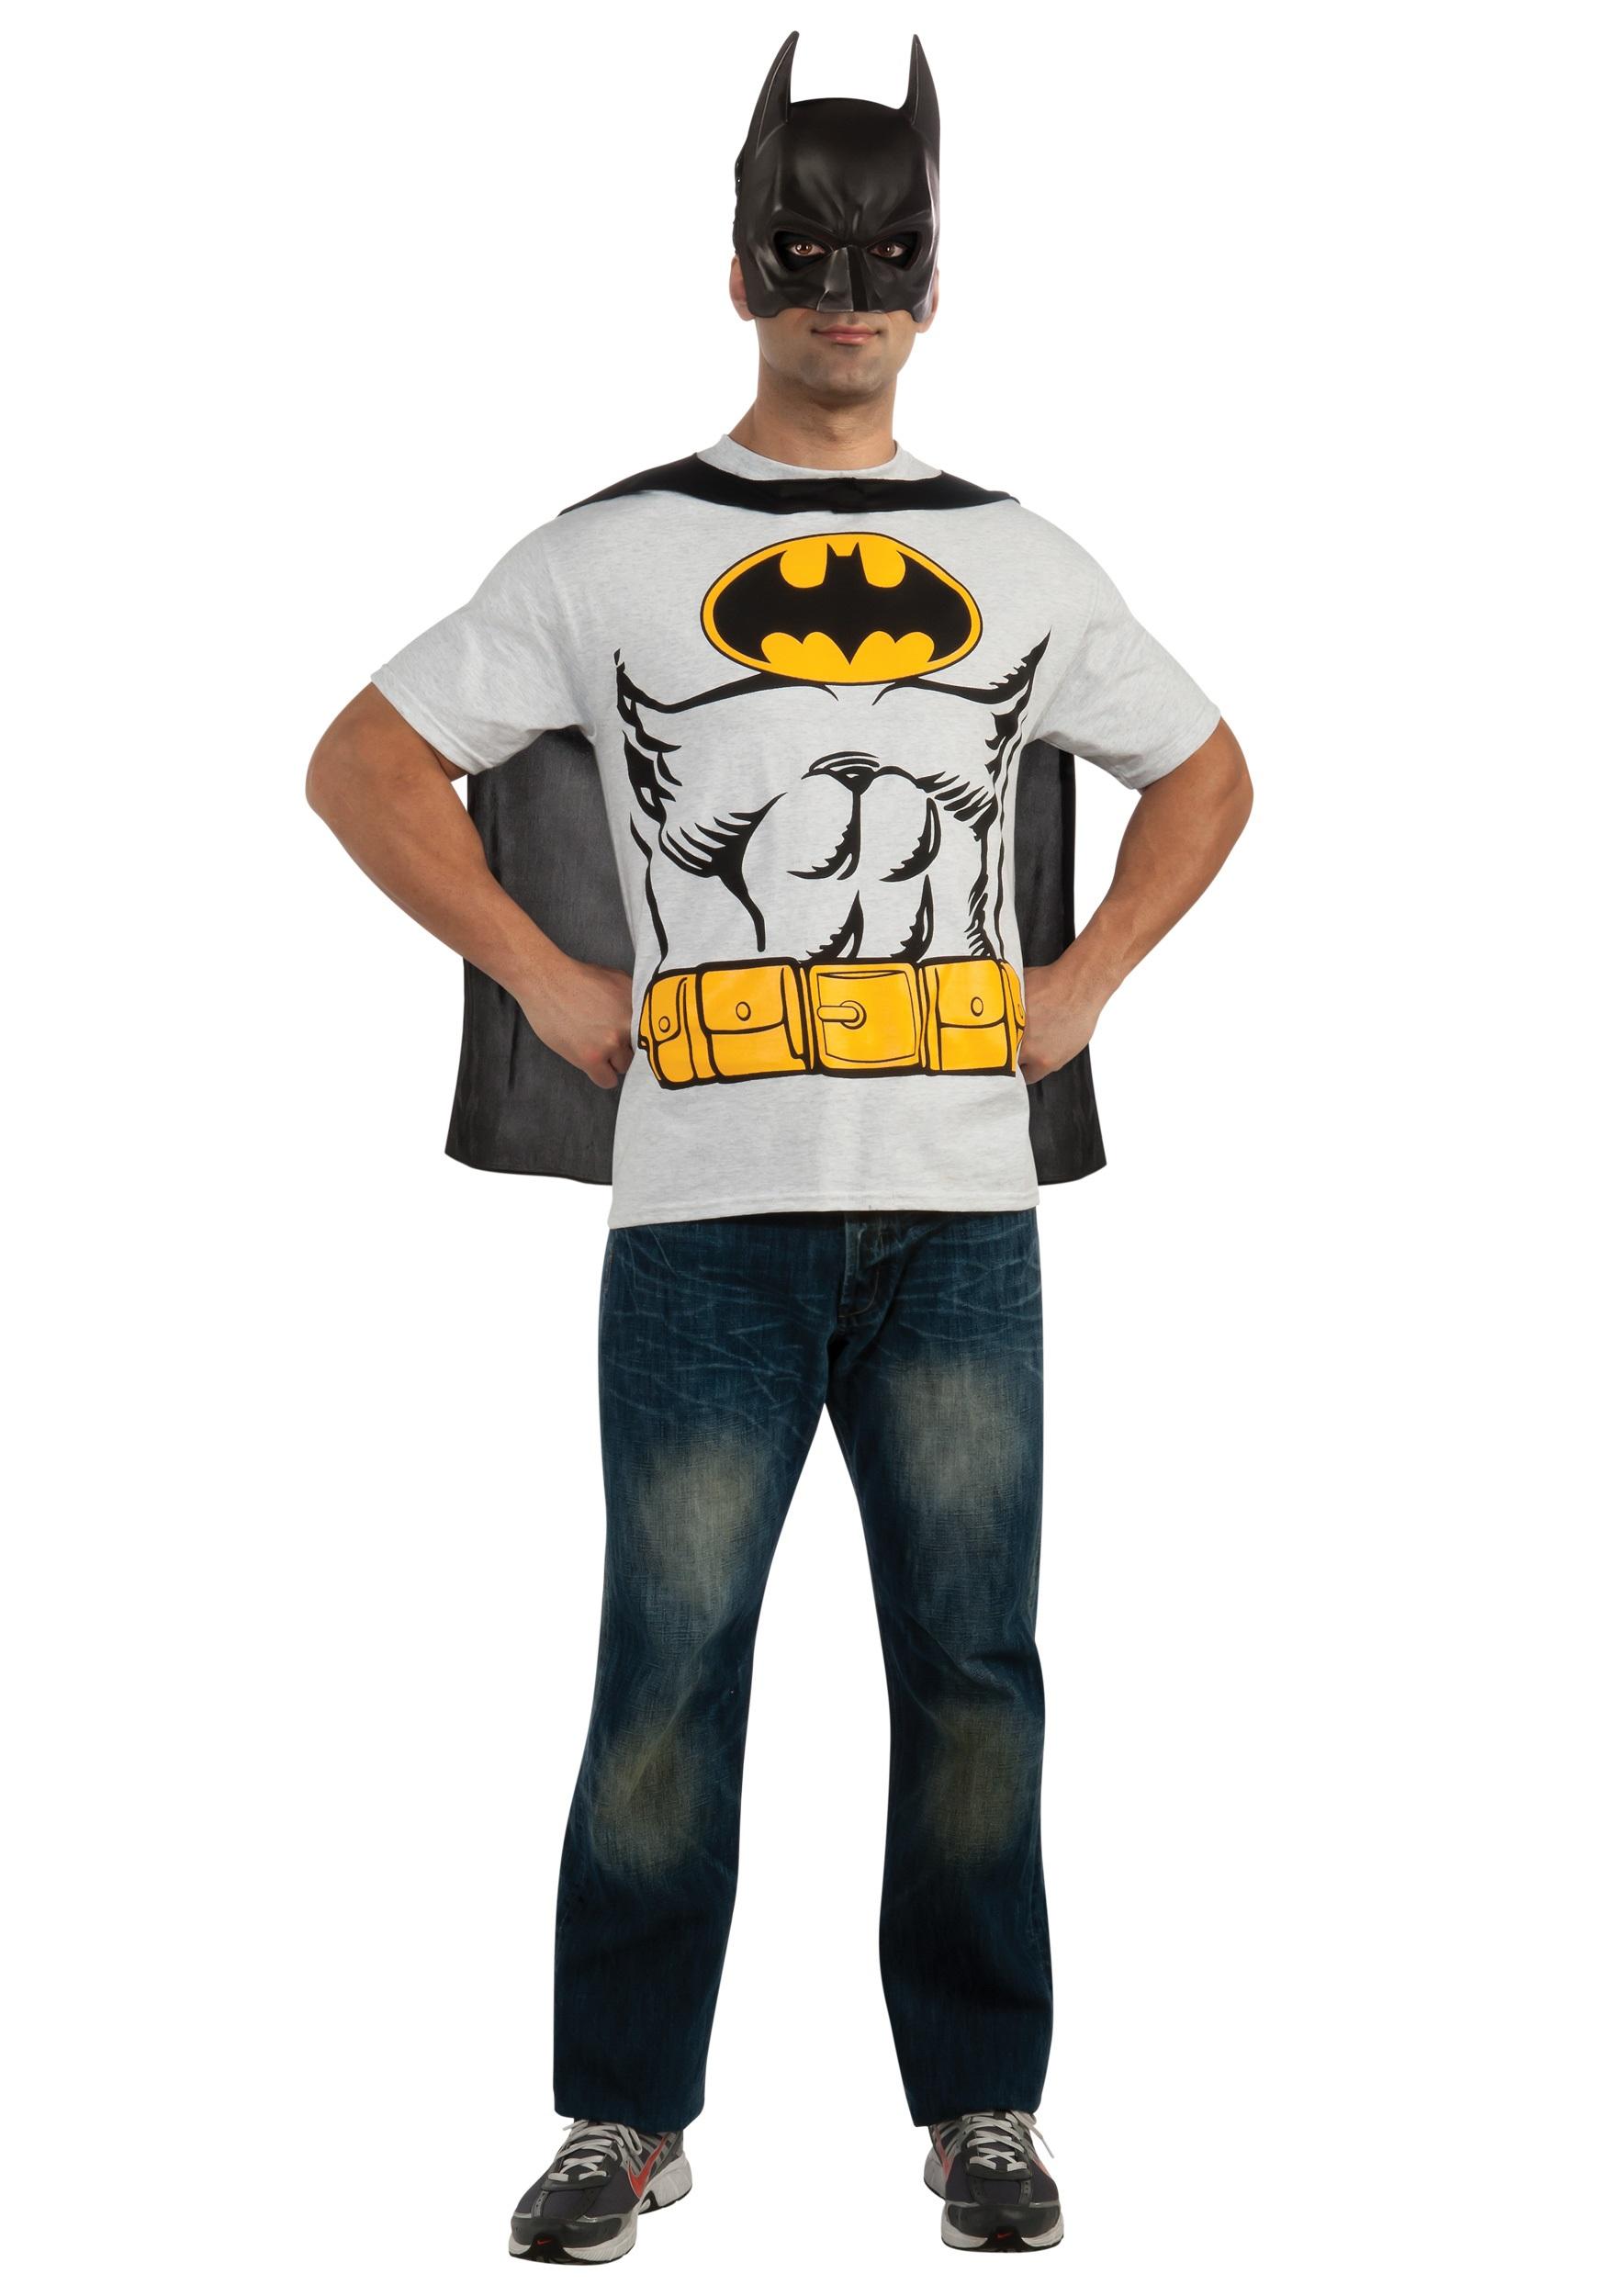 Batman clothing for adults